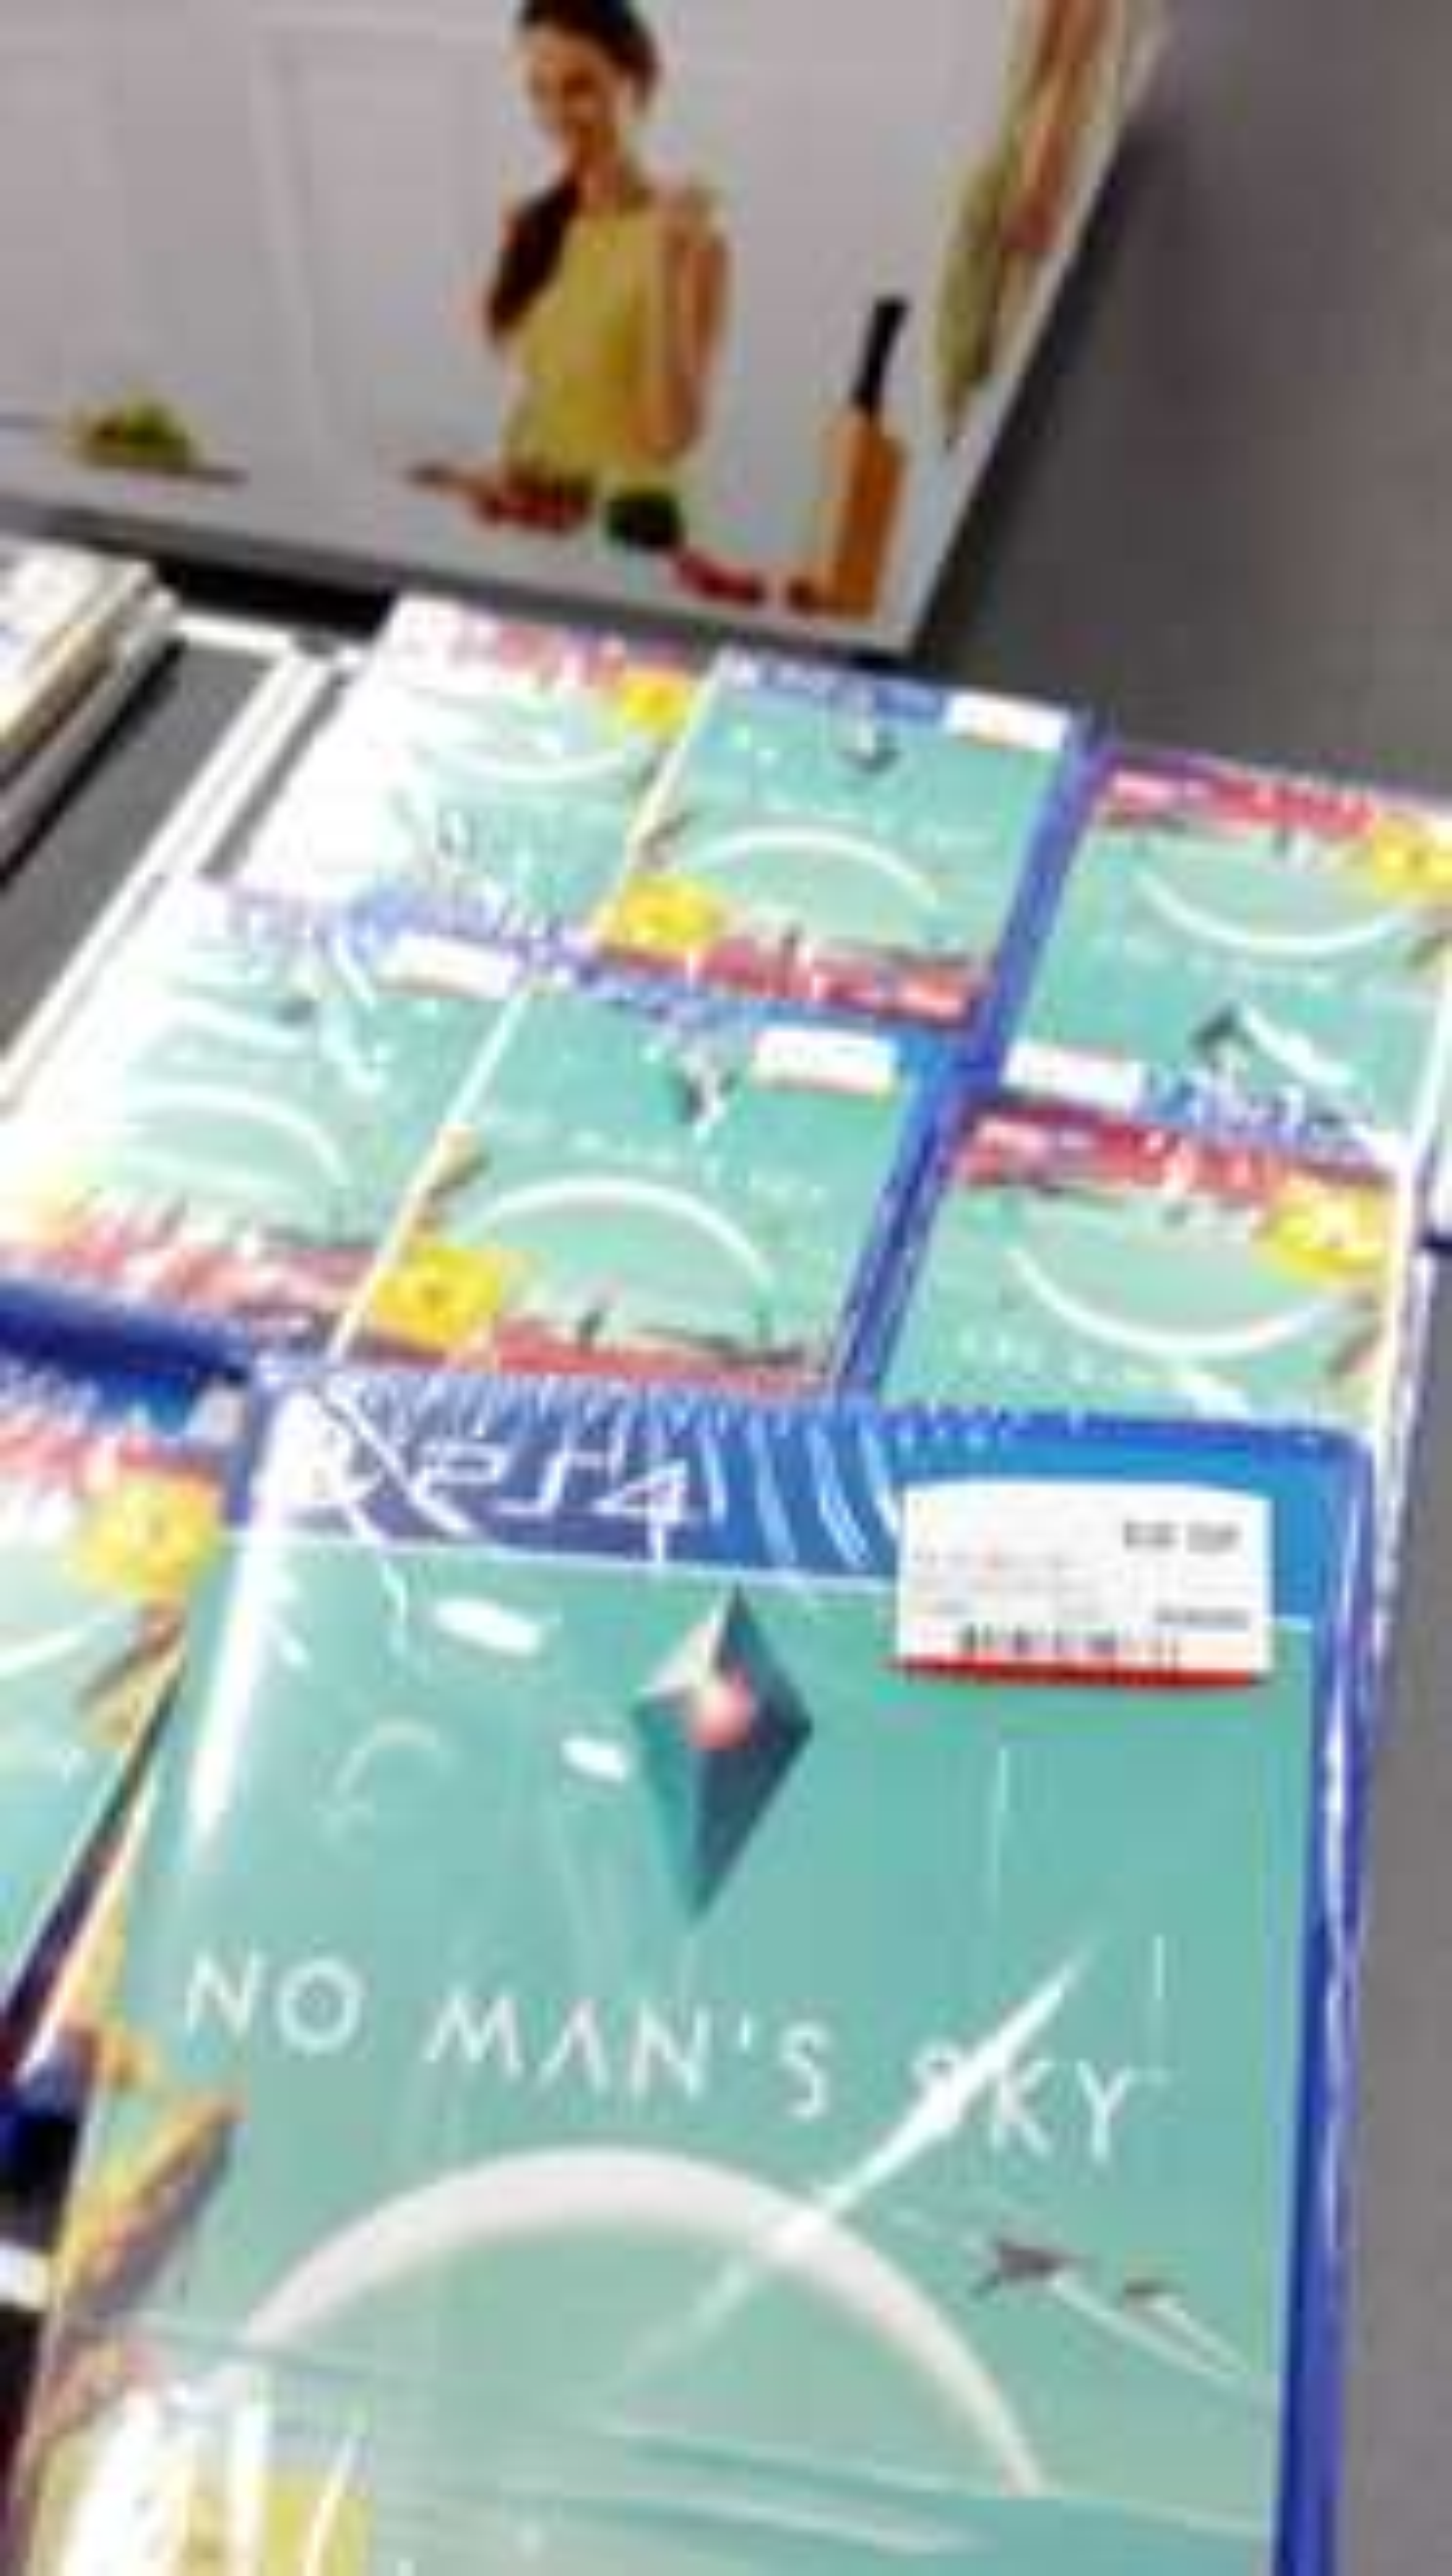 [Regensburg] No Man's Sky (PS4) für 10 € !